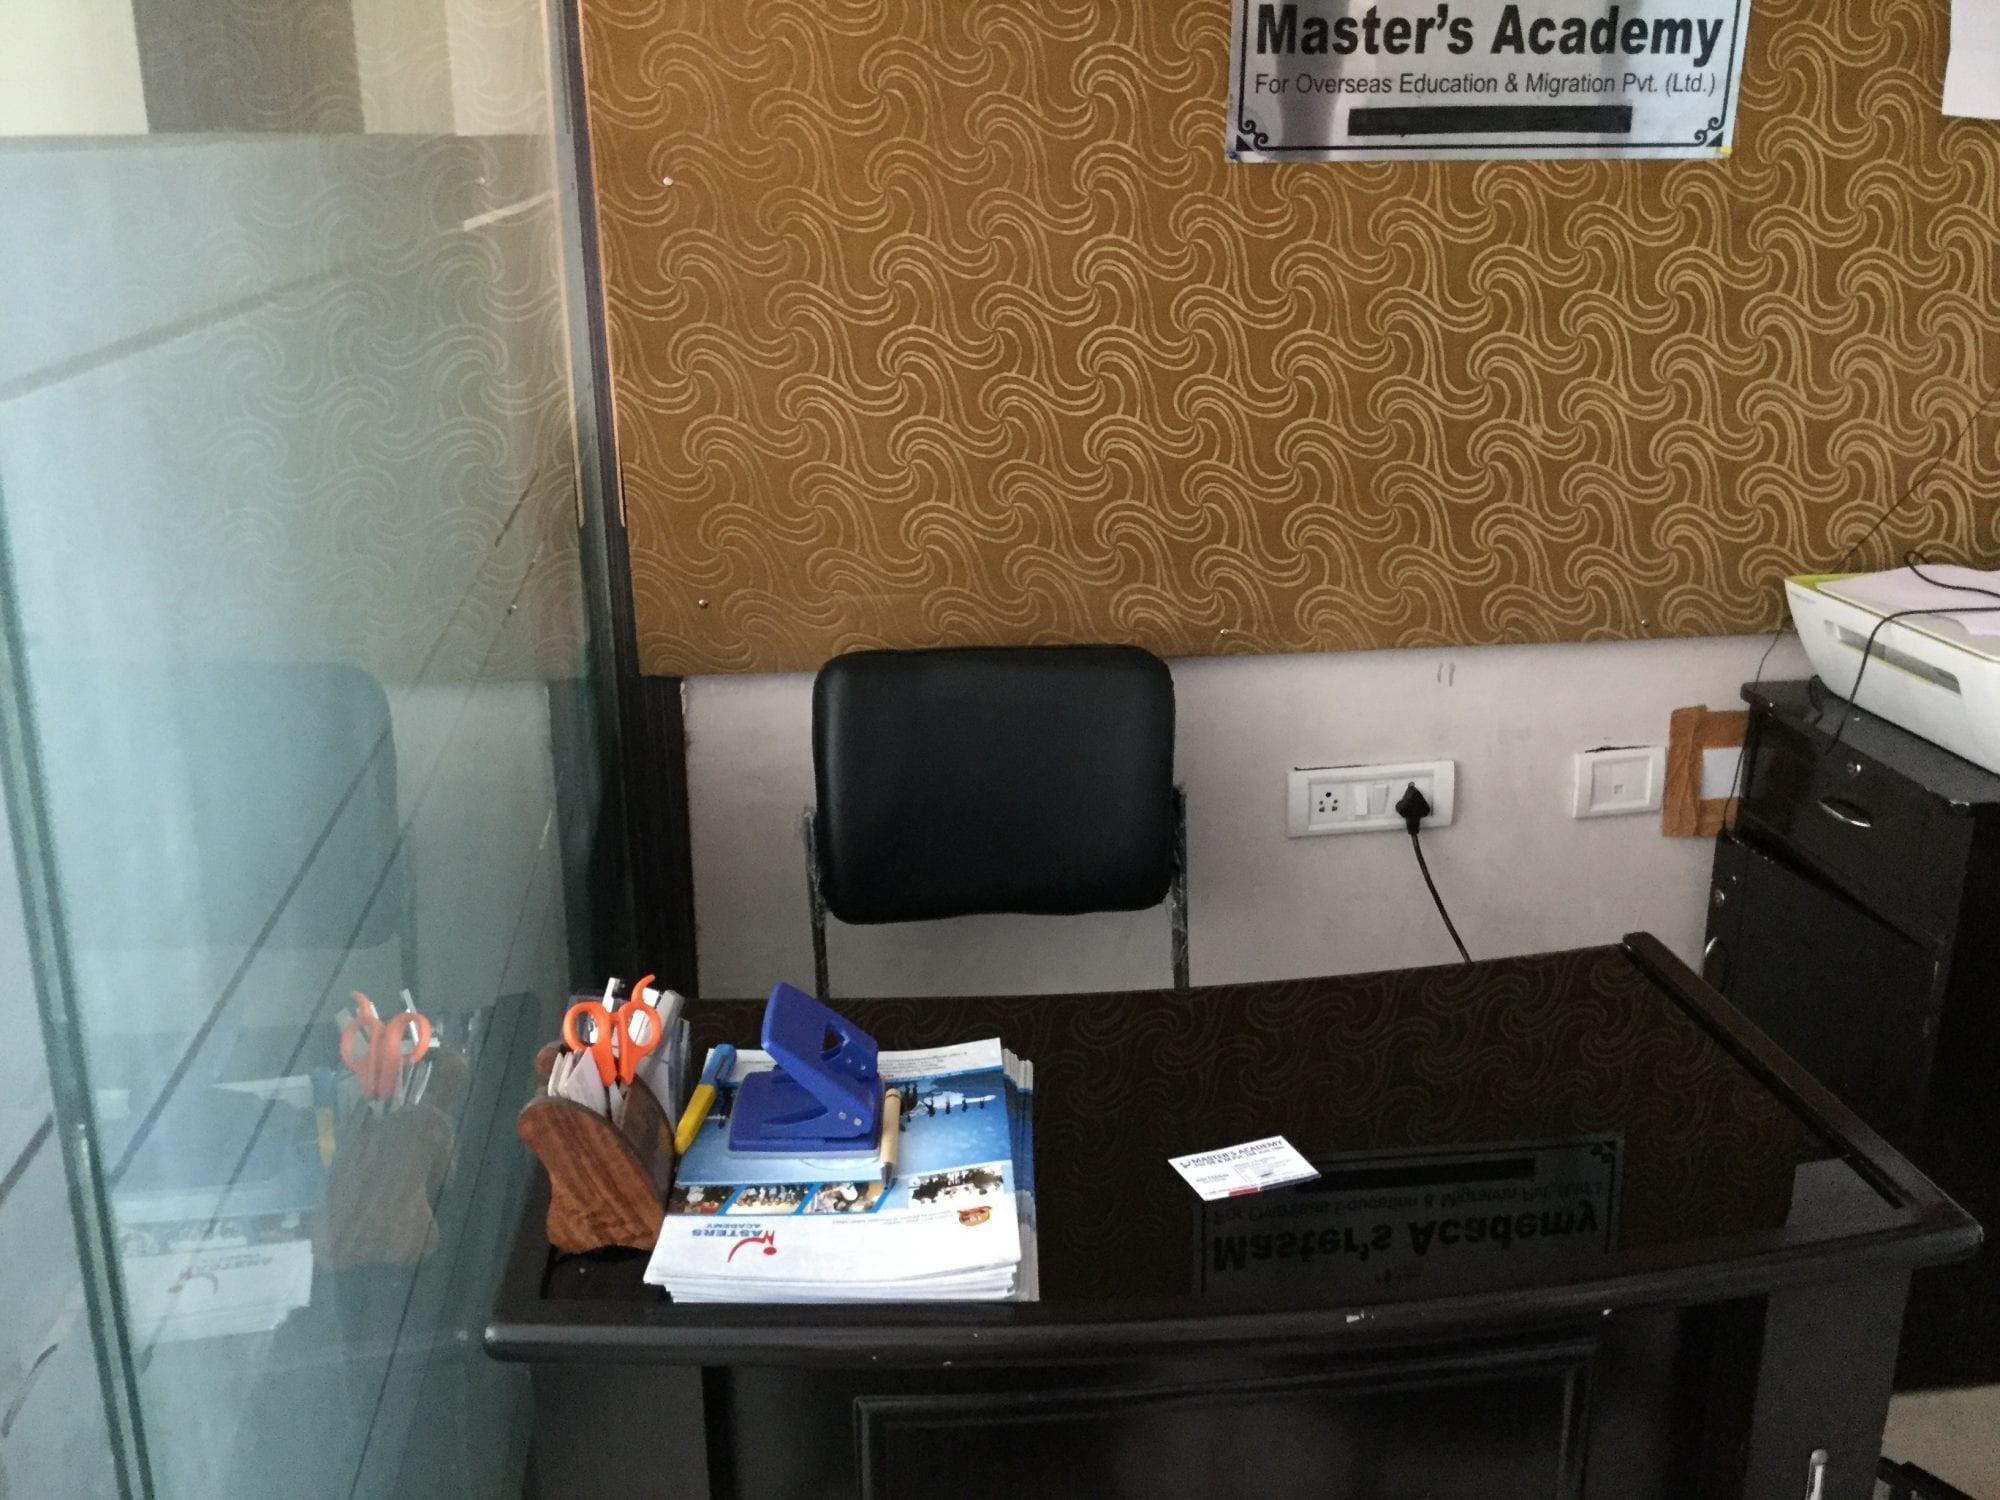 Masters Academy Photos Janakpuri DelhiNCR Pictures Images